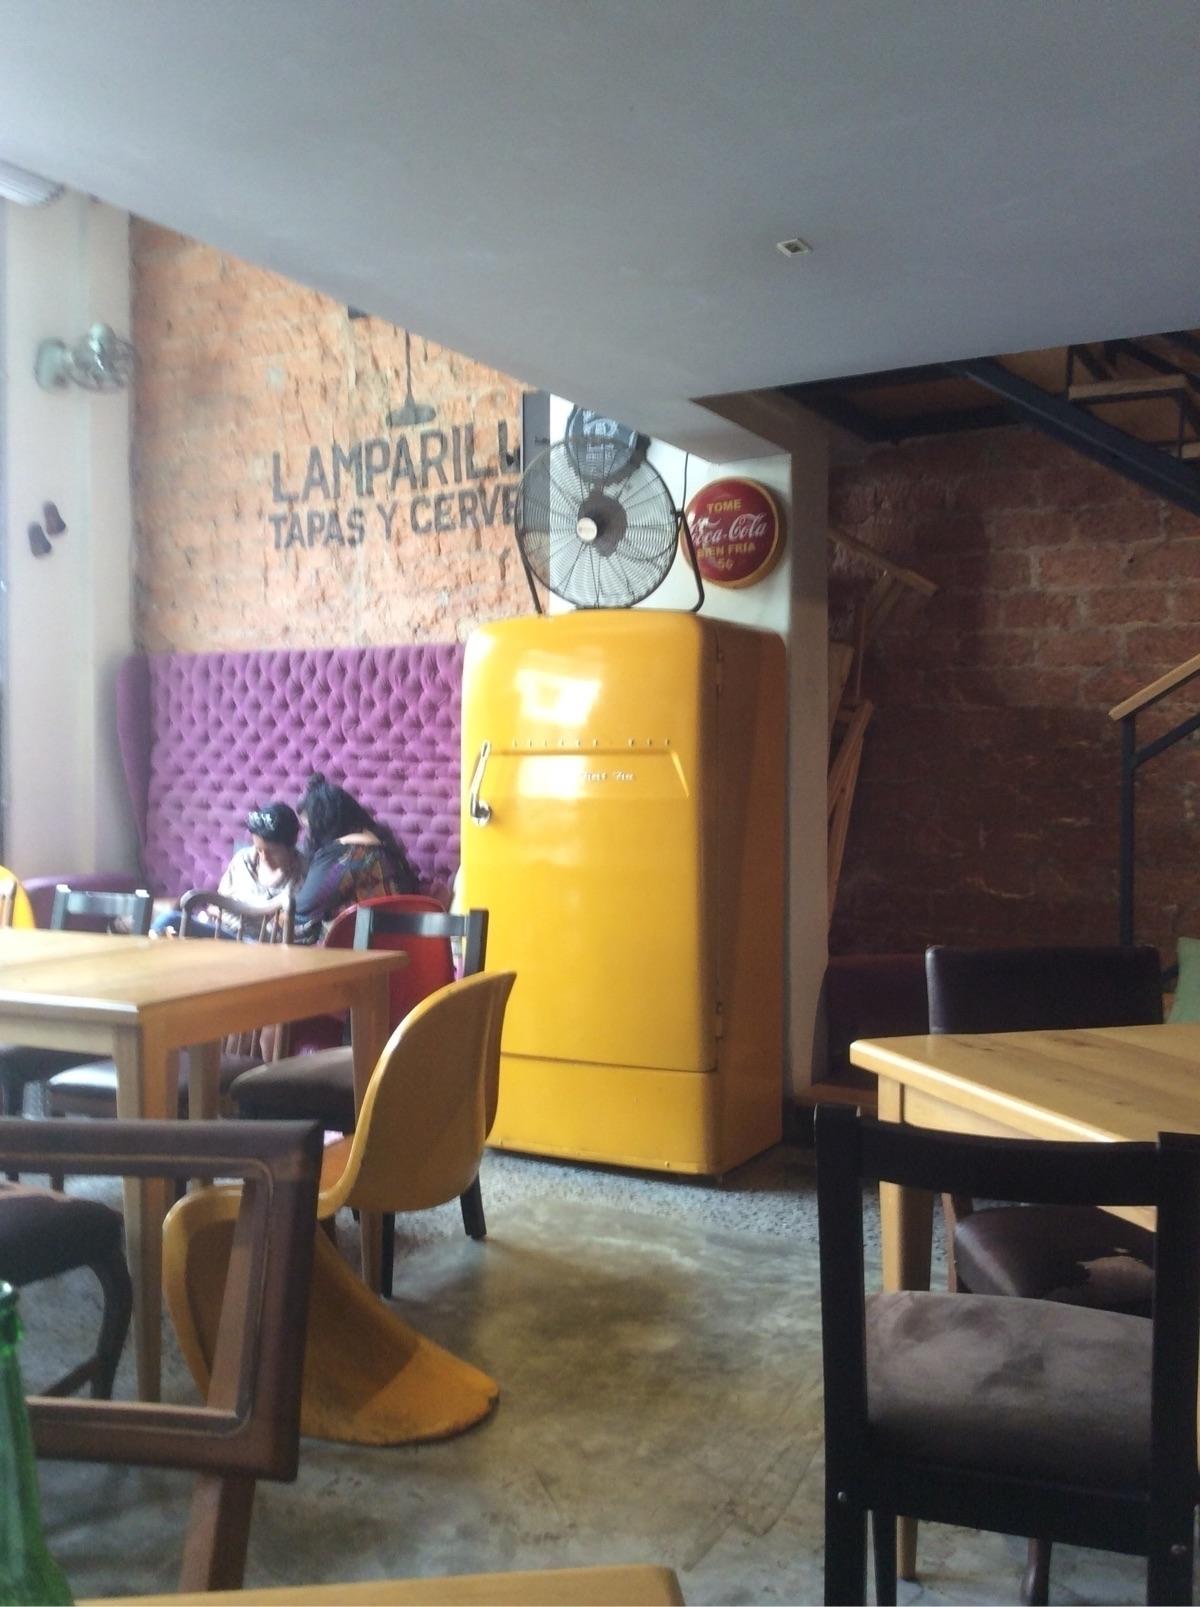 havana, cuba food surprising, t - interrailing | ello